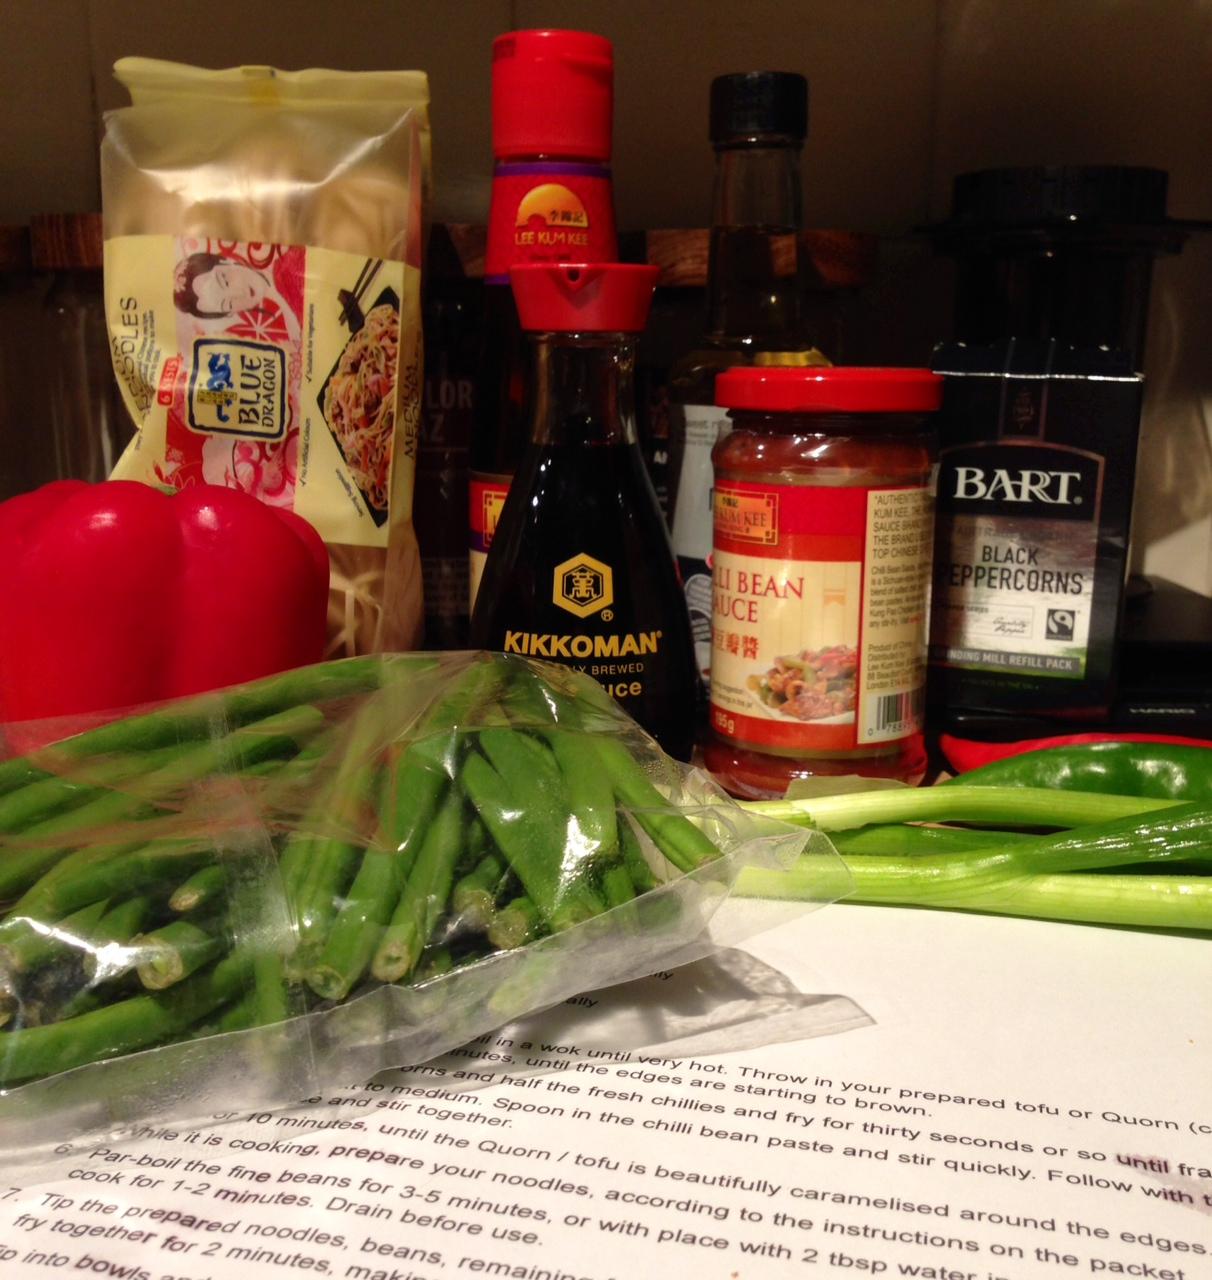 szechuan ingredients